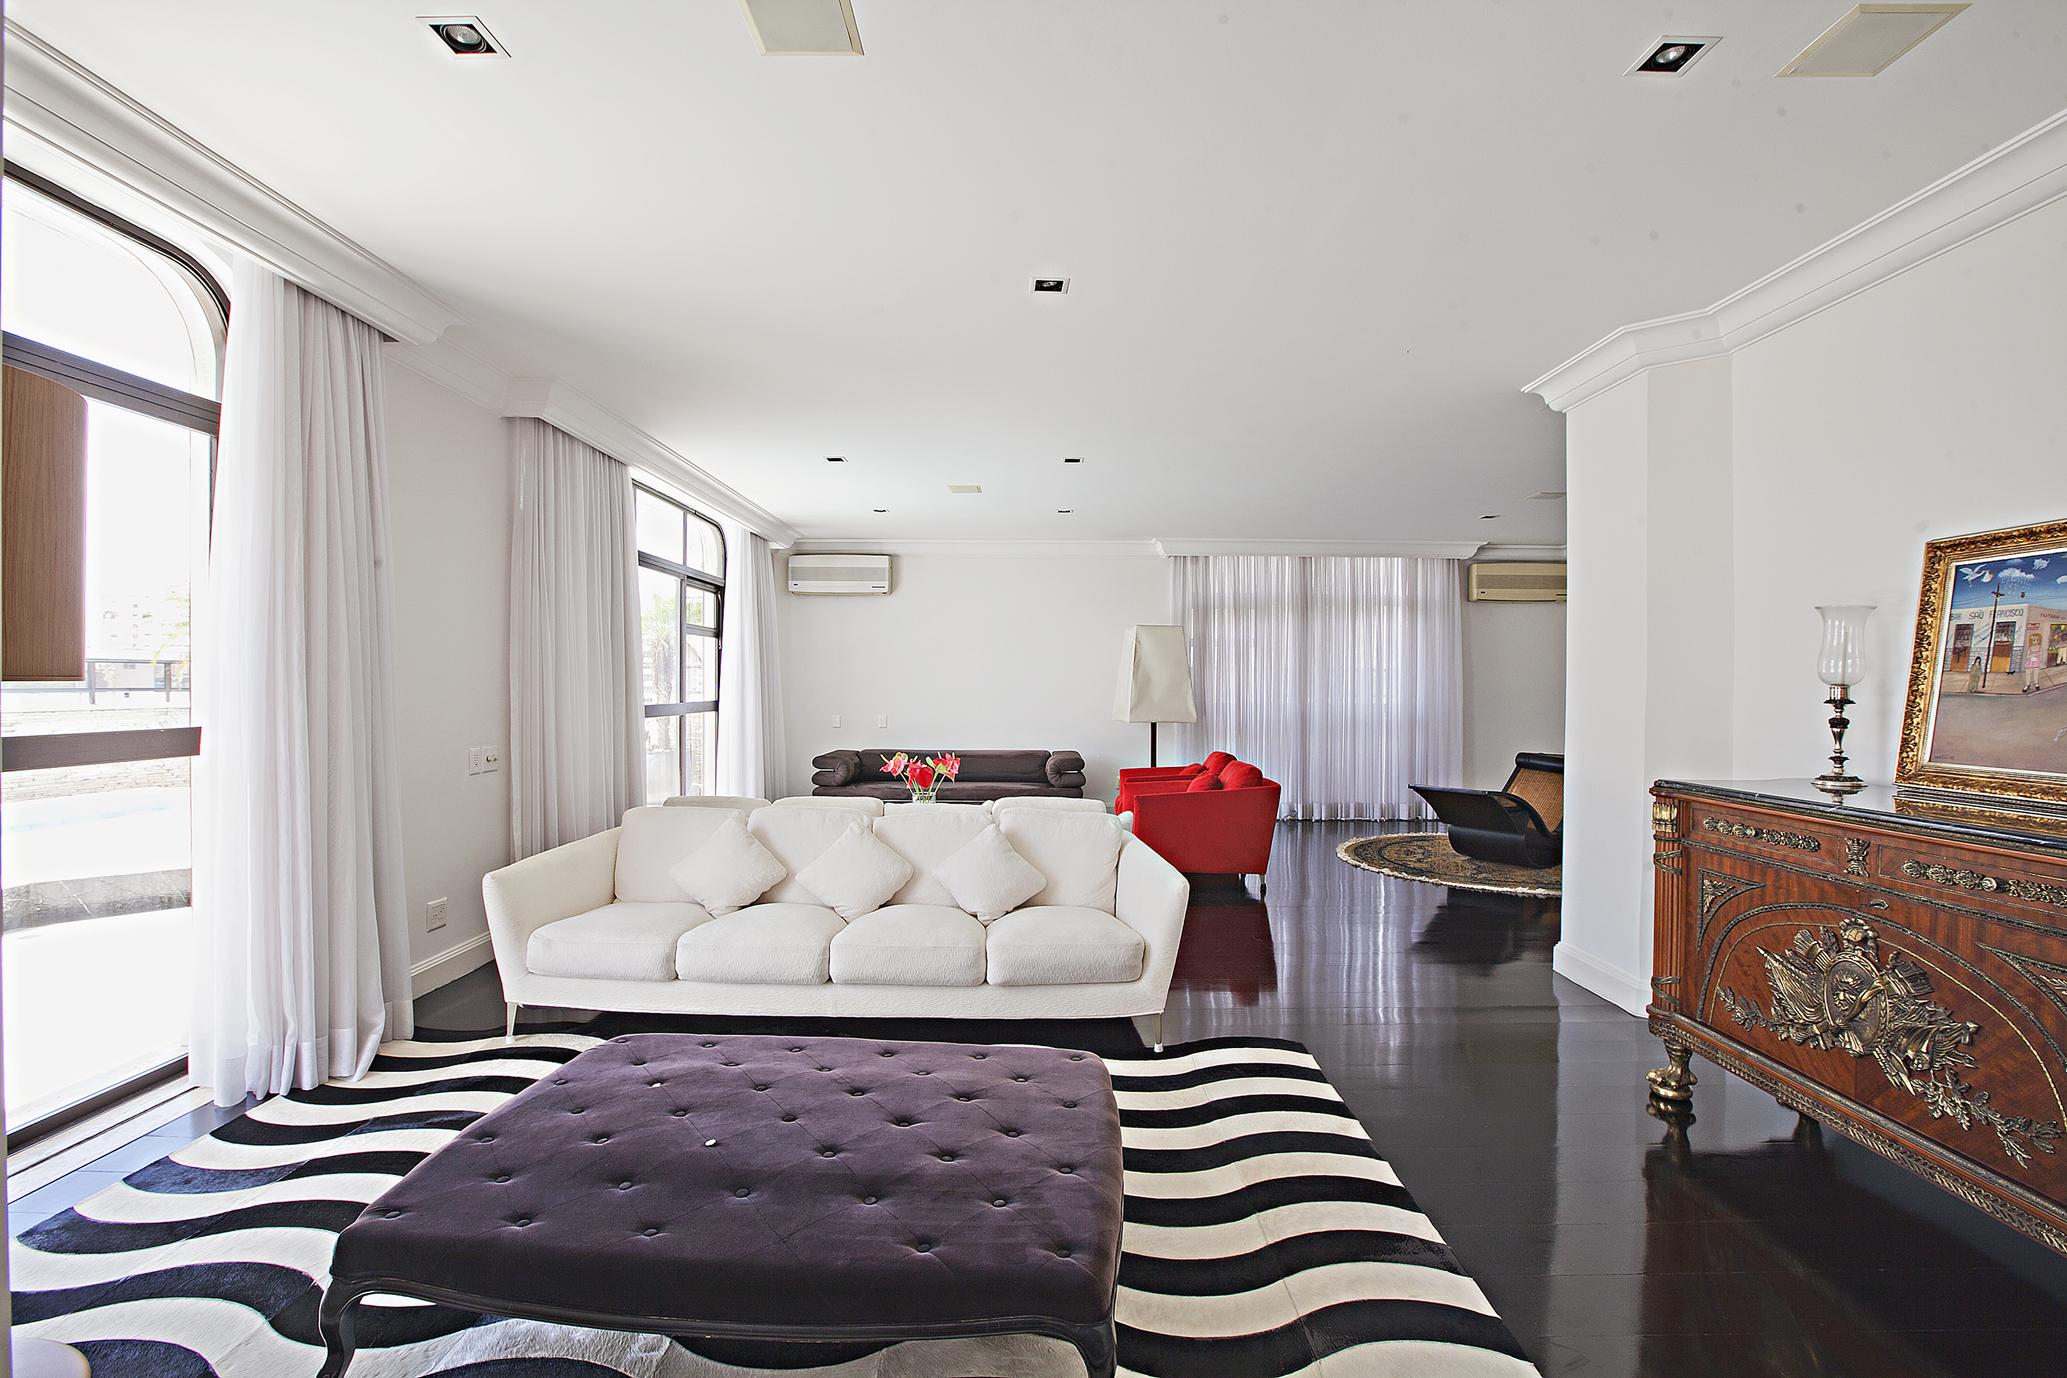 Single Family Home for Sale at Excellent penthouse in privileged location Alameda Ministro Rocha Azevedo Sao Paulo, Sao Paulo, 01410-001 Brazil